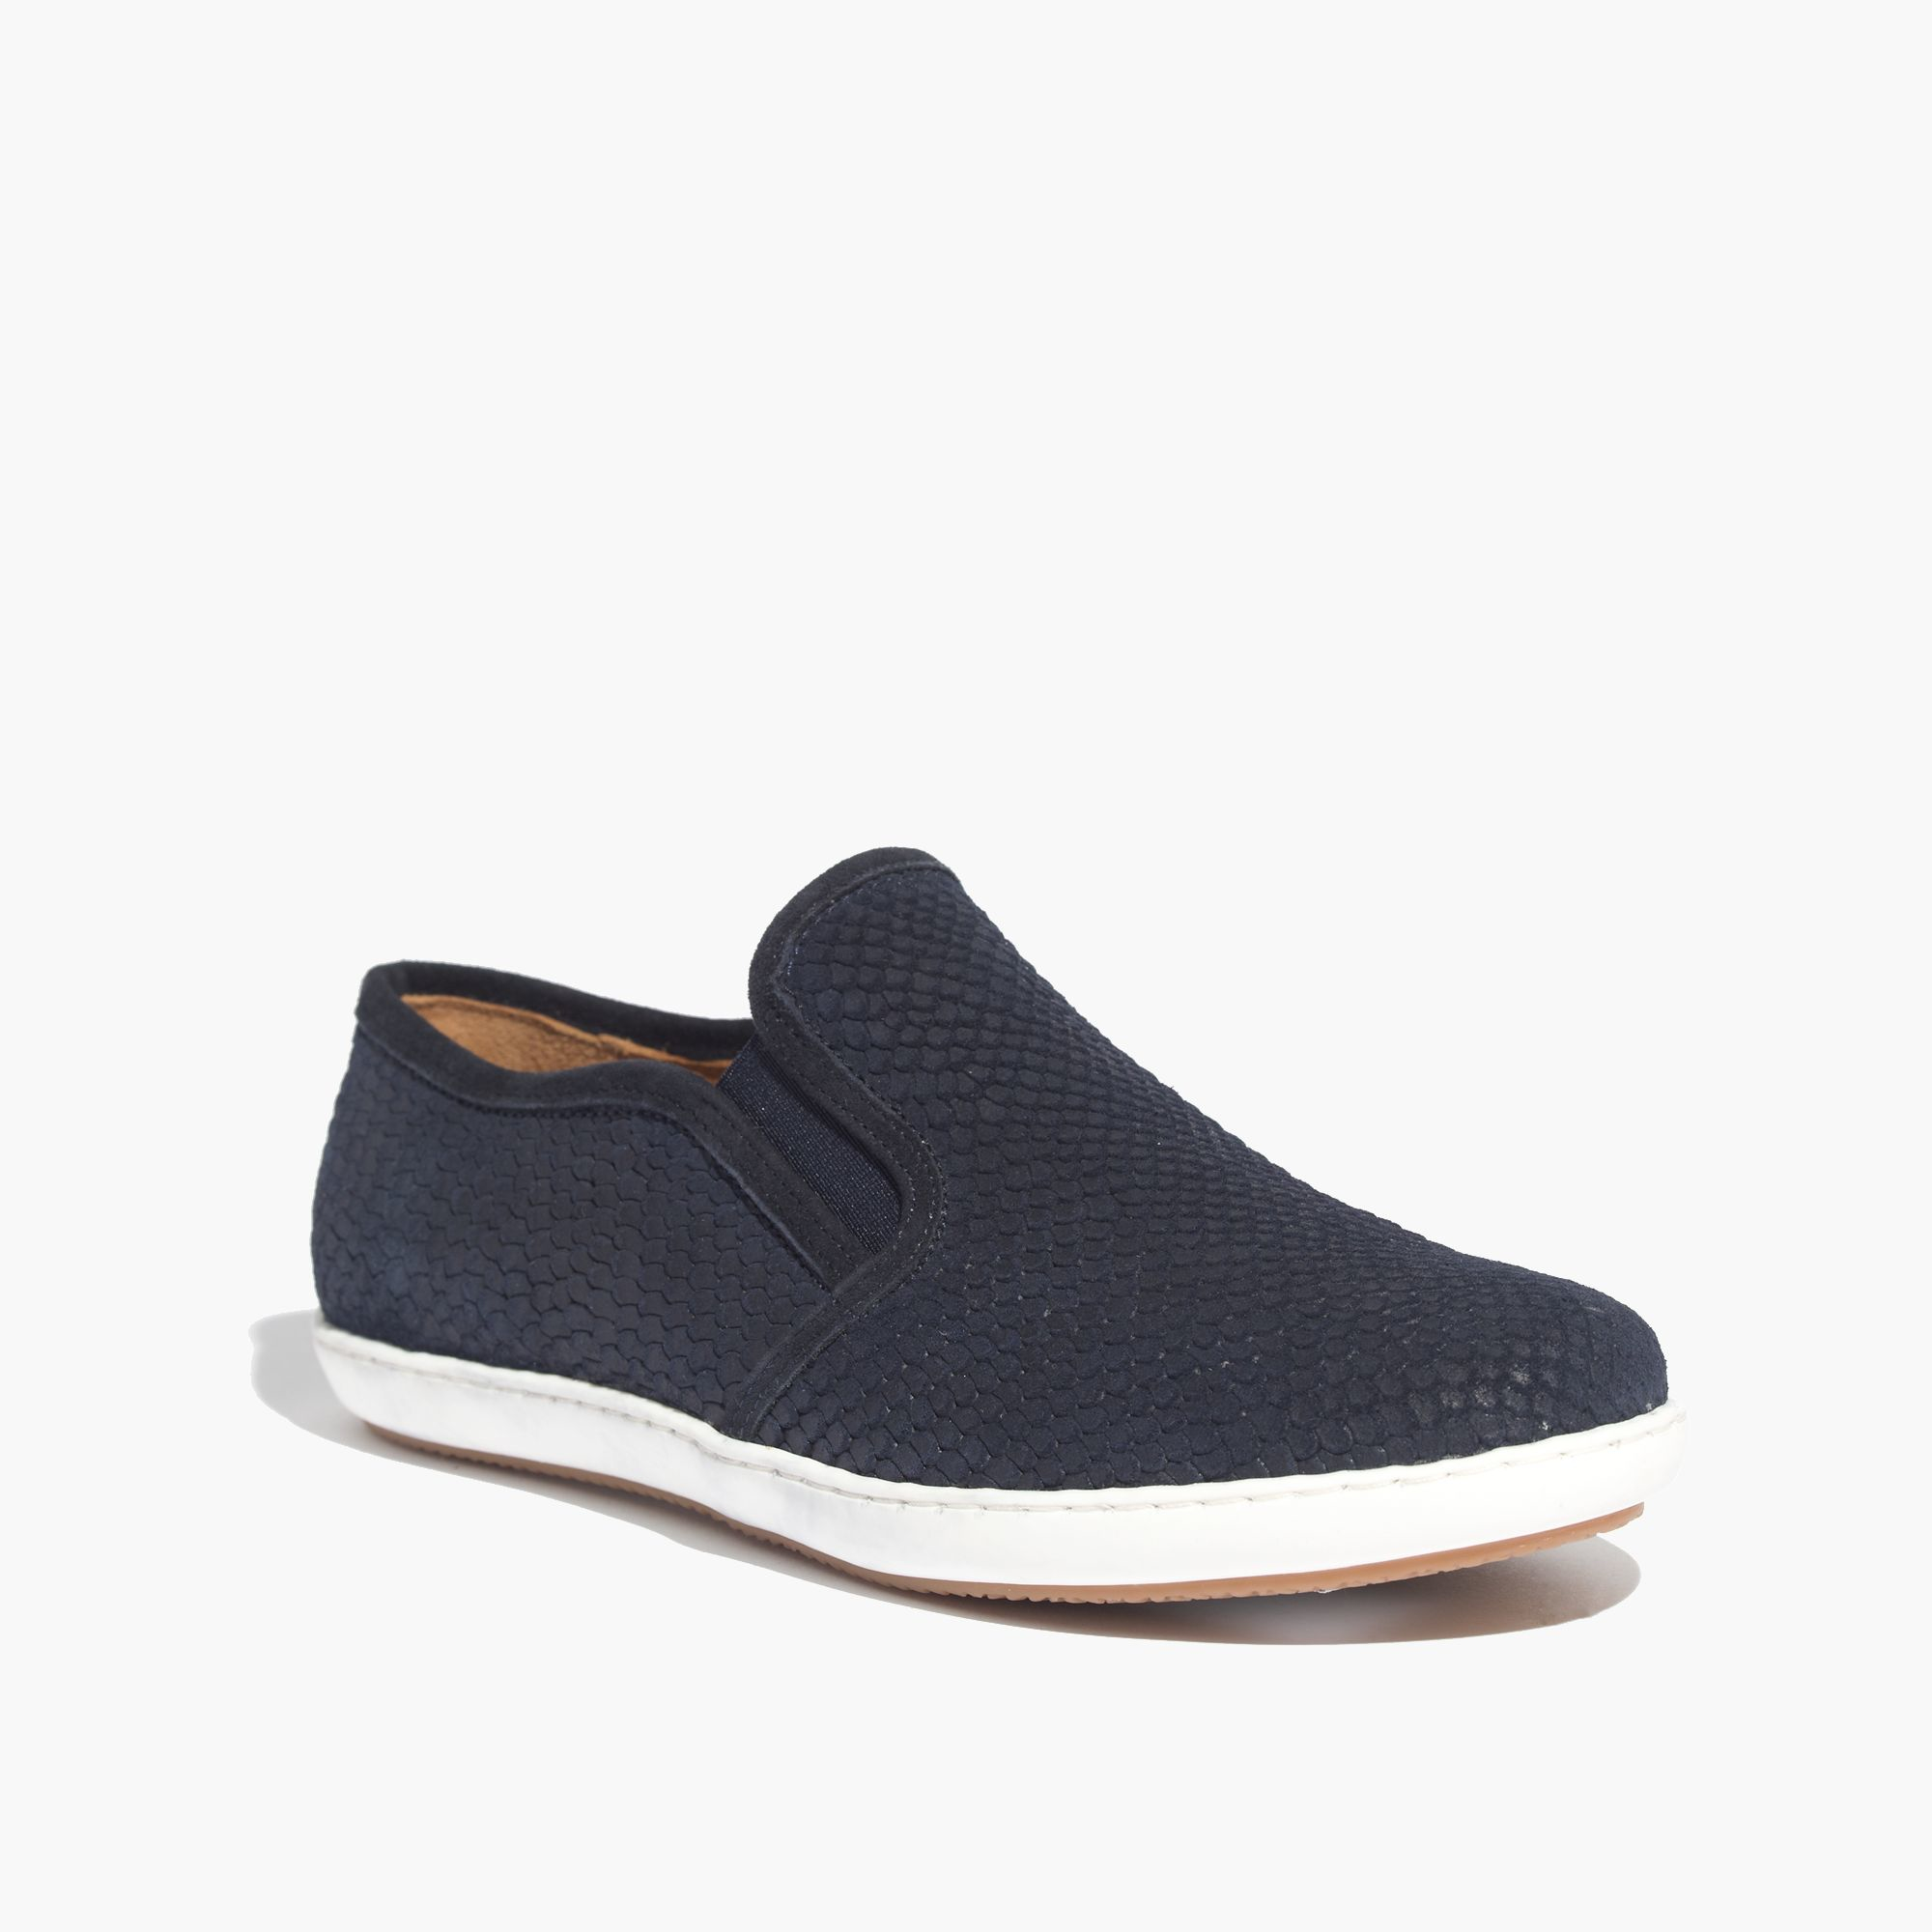 Madewell Et Sézane® Leather Slip-on Sneakers in Deep Navy (Blue)